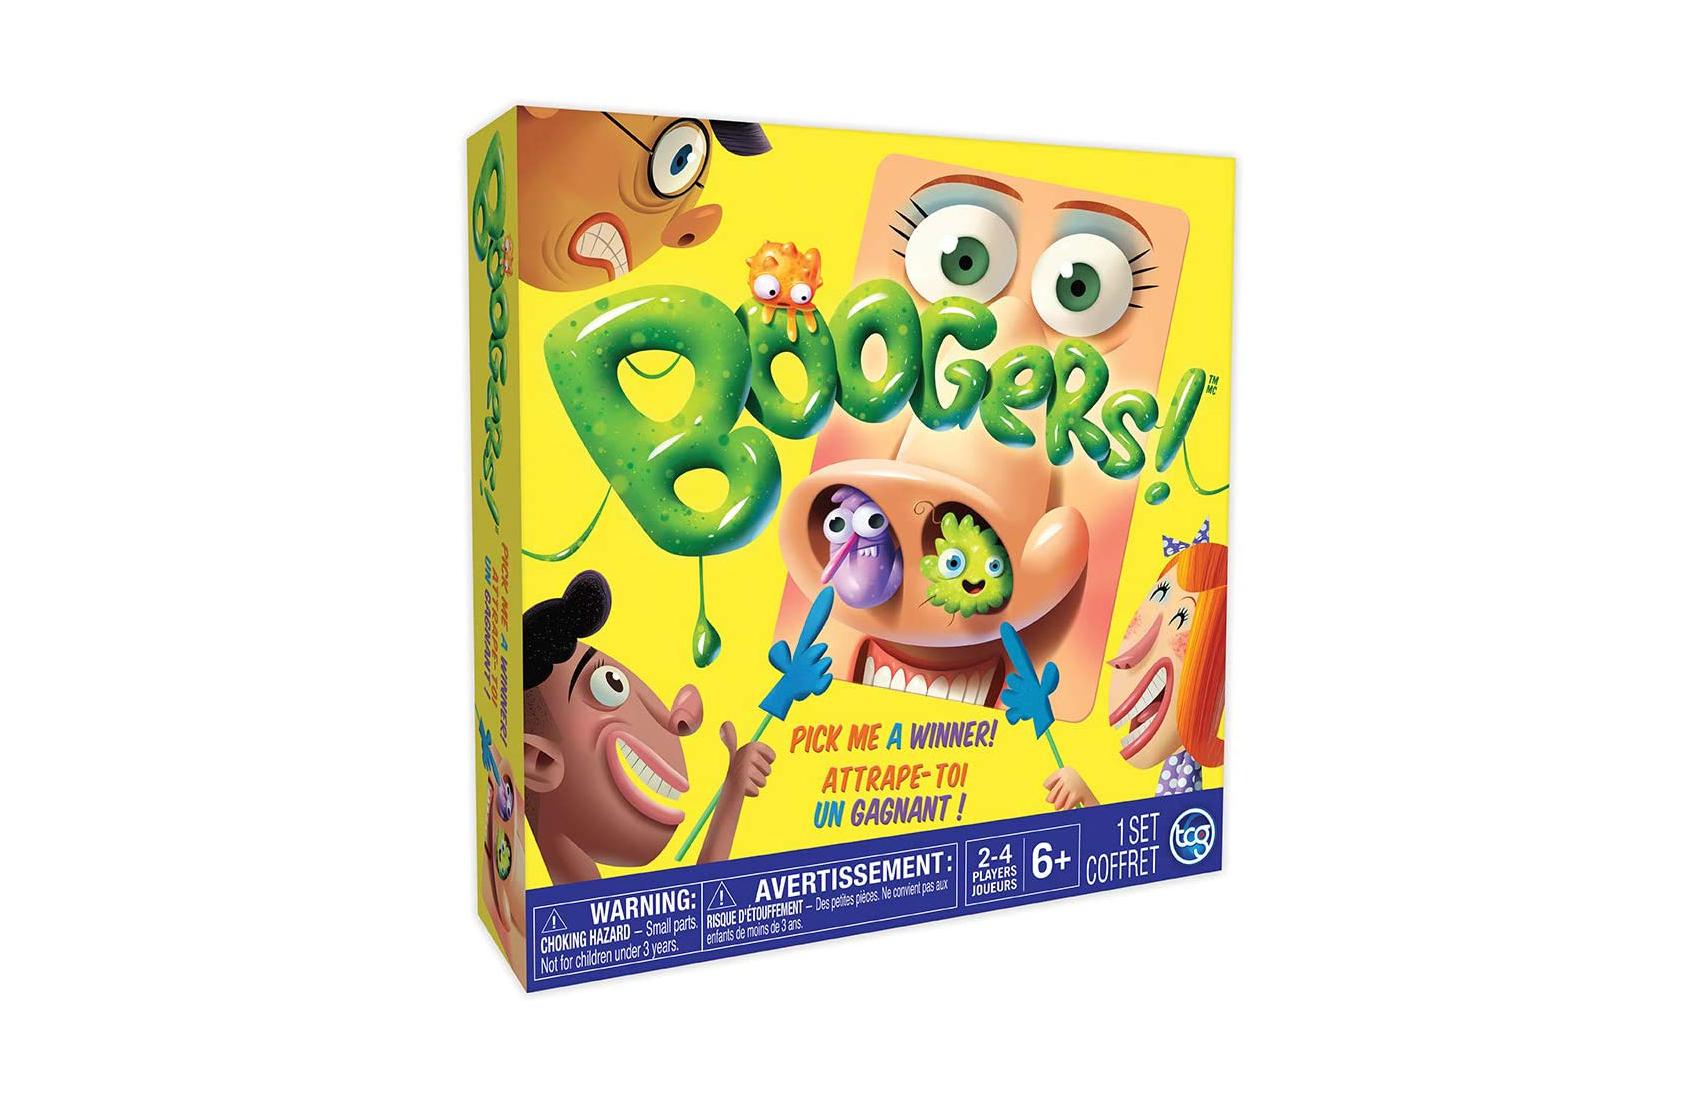 TCG Boogers Box